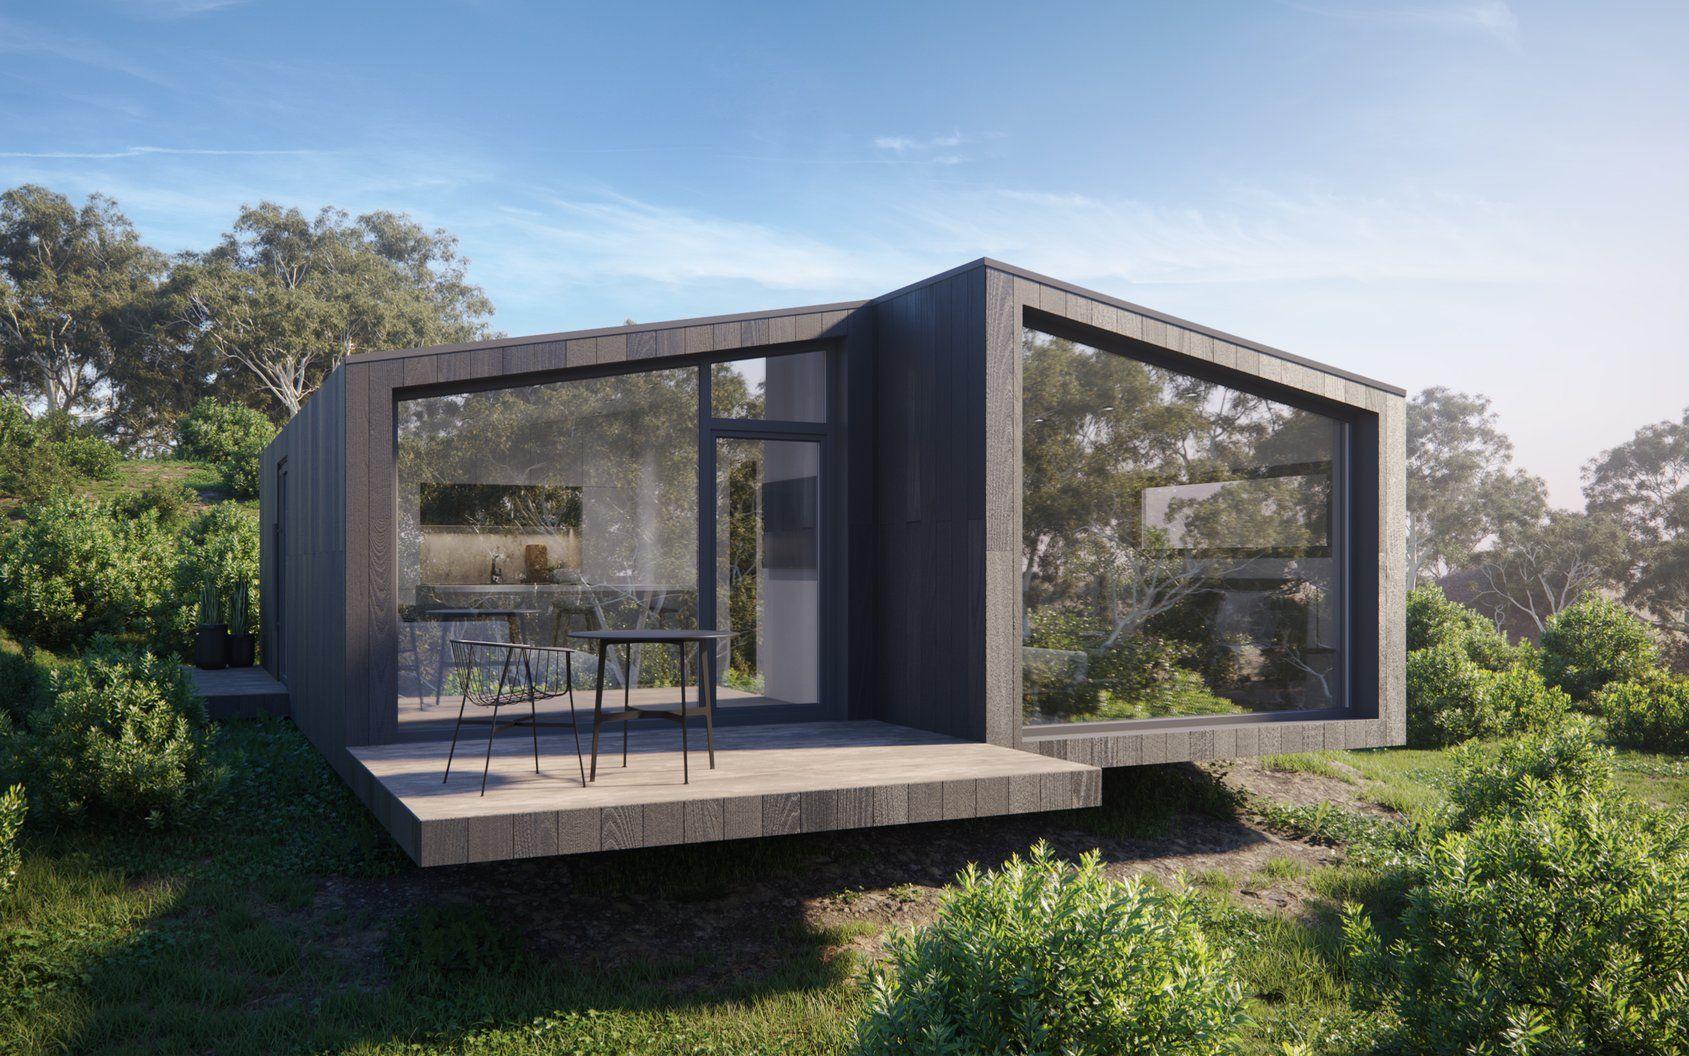 Nook Nz Nook Nz Transportable Homes Cabins Auckland Prefab Homes Prefab Modular Building